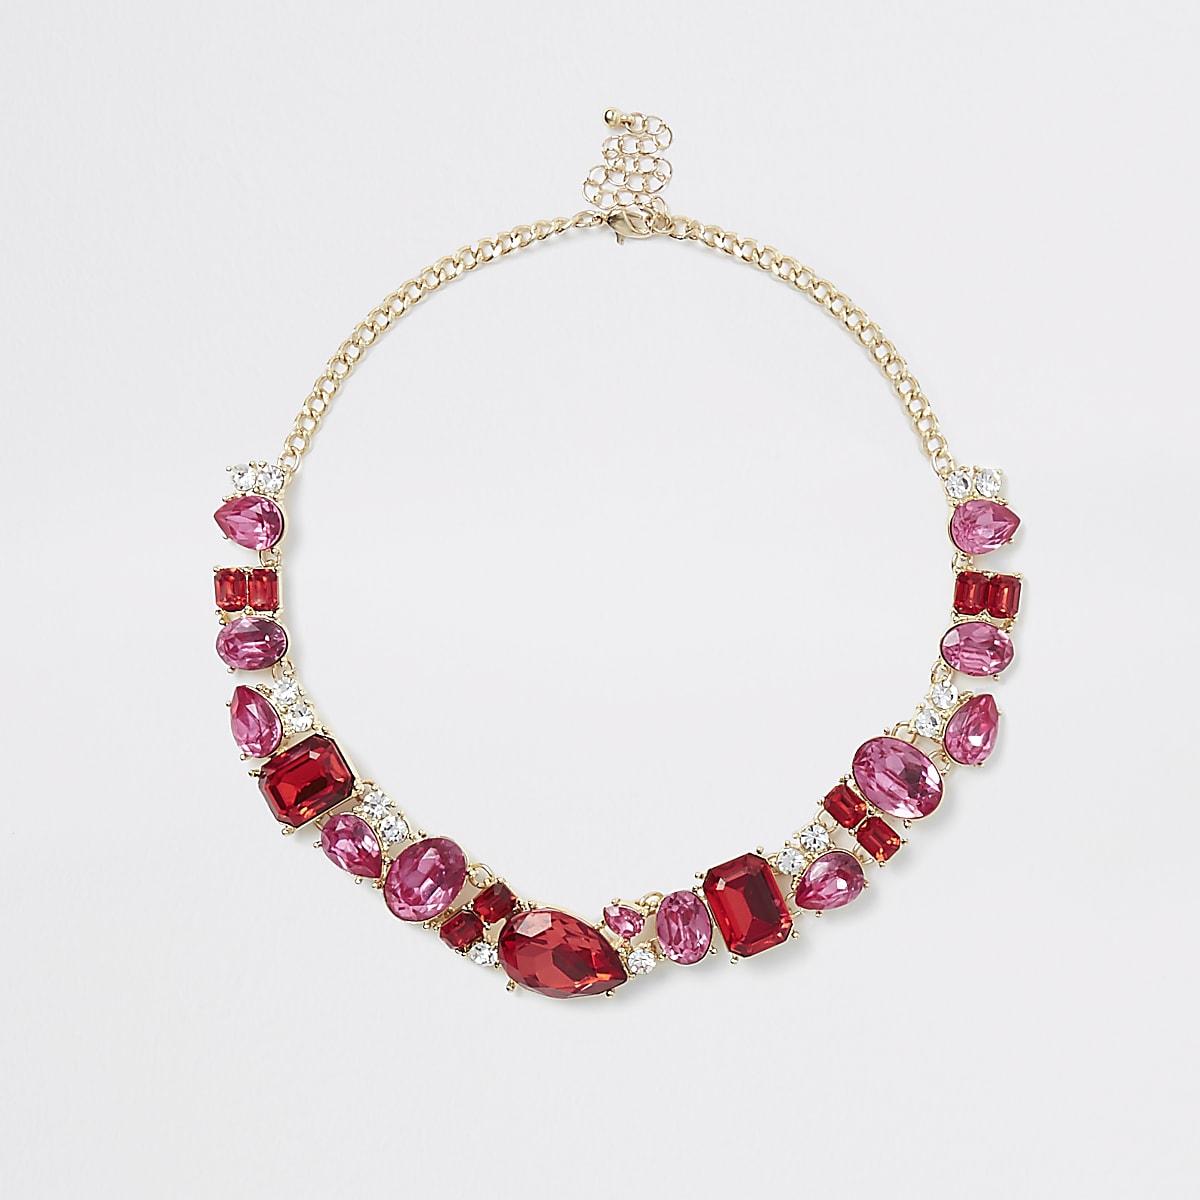 Gold tone pink jewel pendant necklace